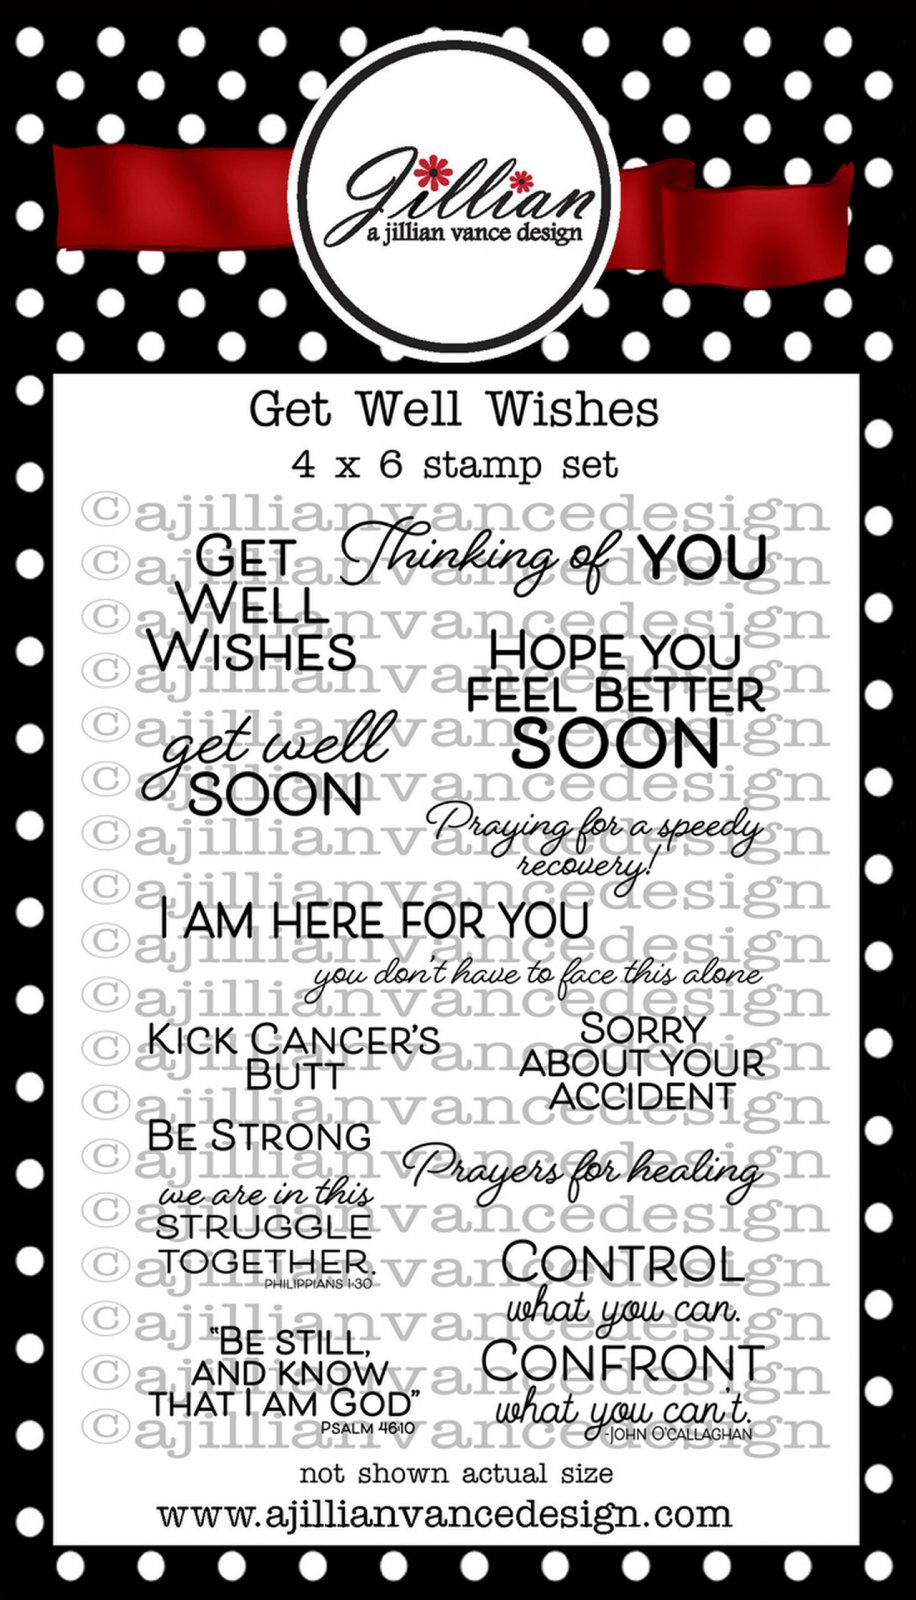 Jillian Vance - Get Well Wishes Stamp Set